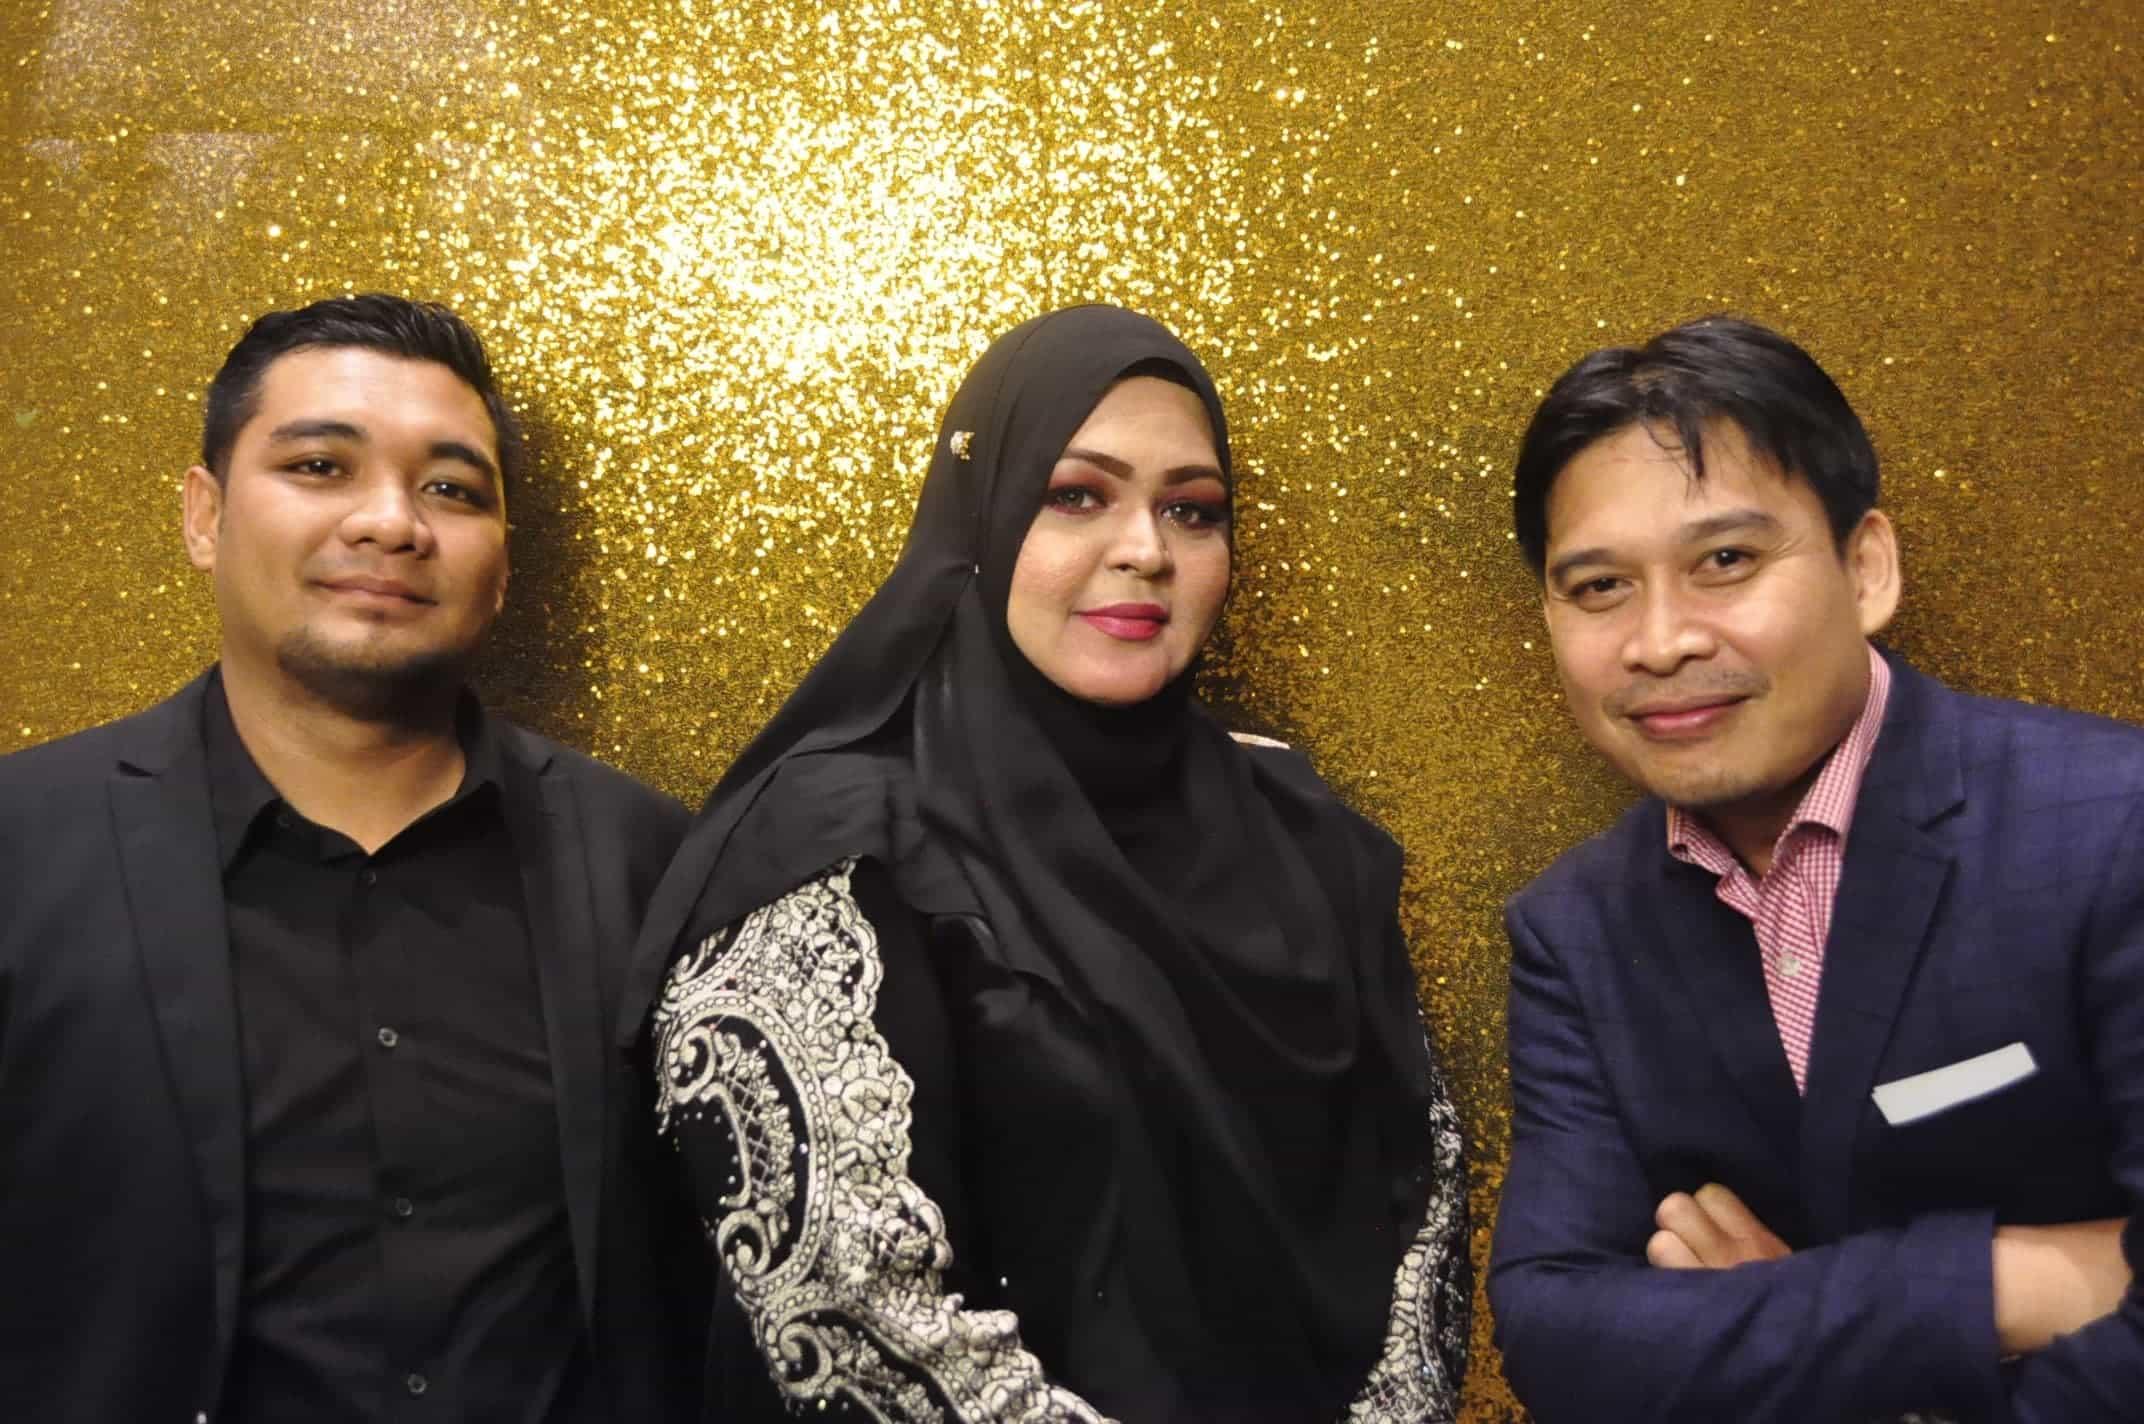 Malam Gala Anggun 2018 (Photobooth) 11